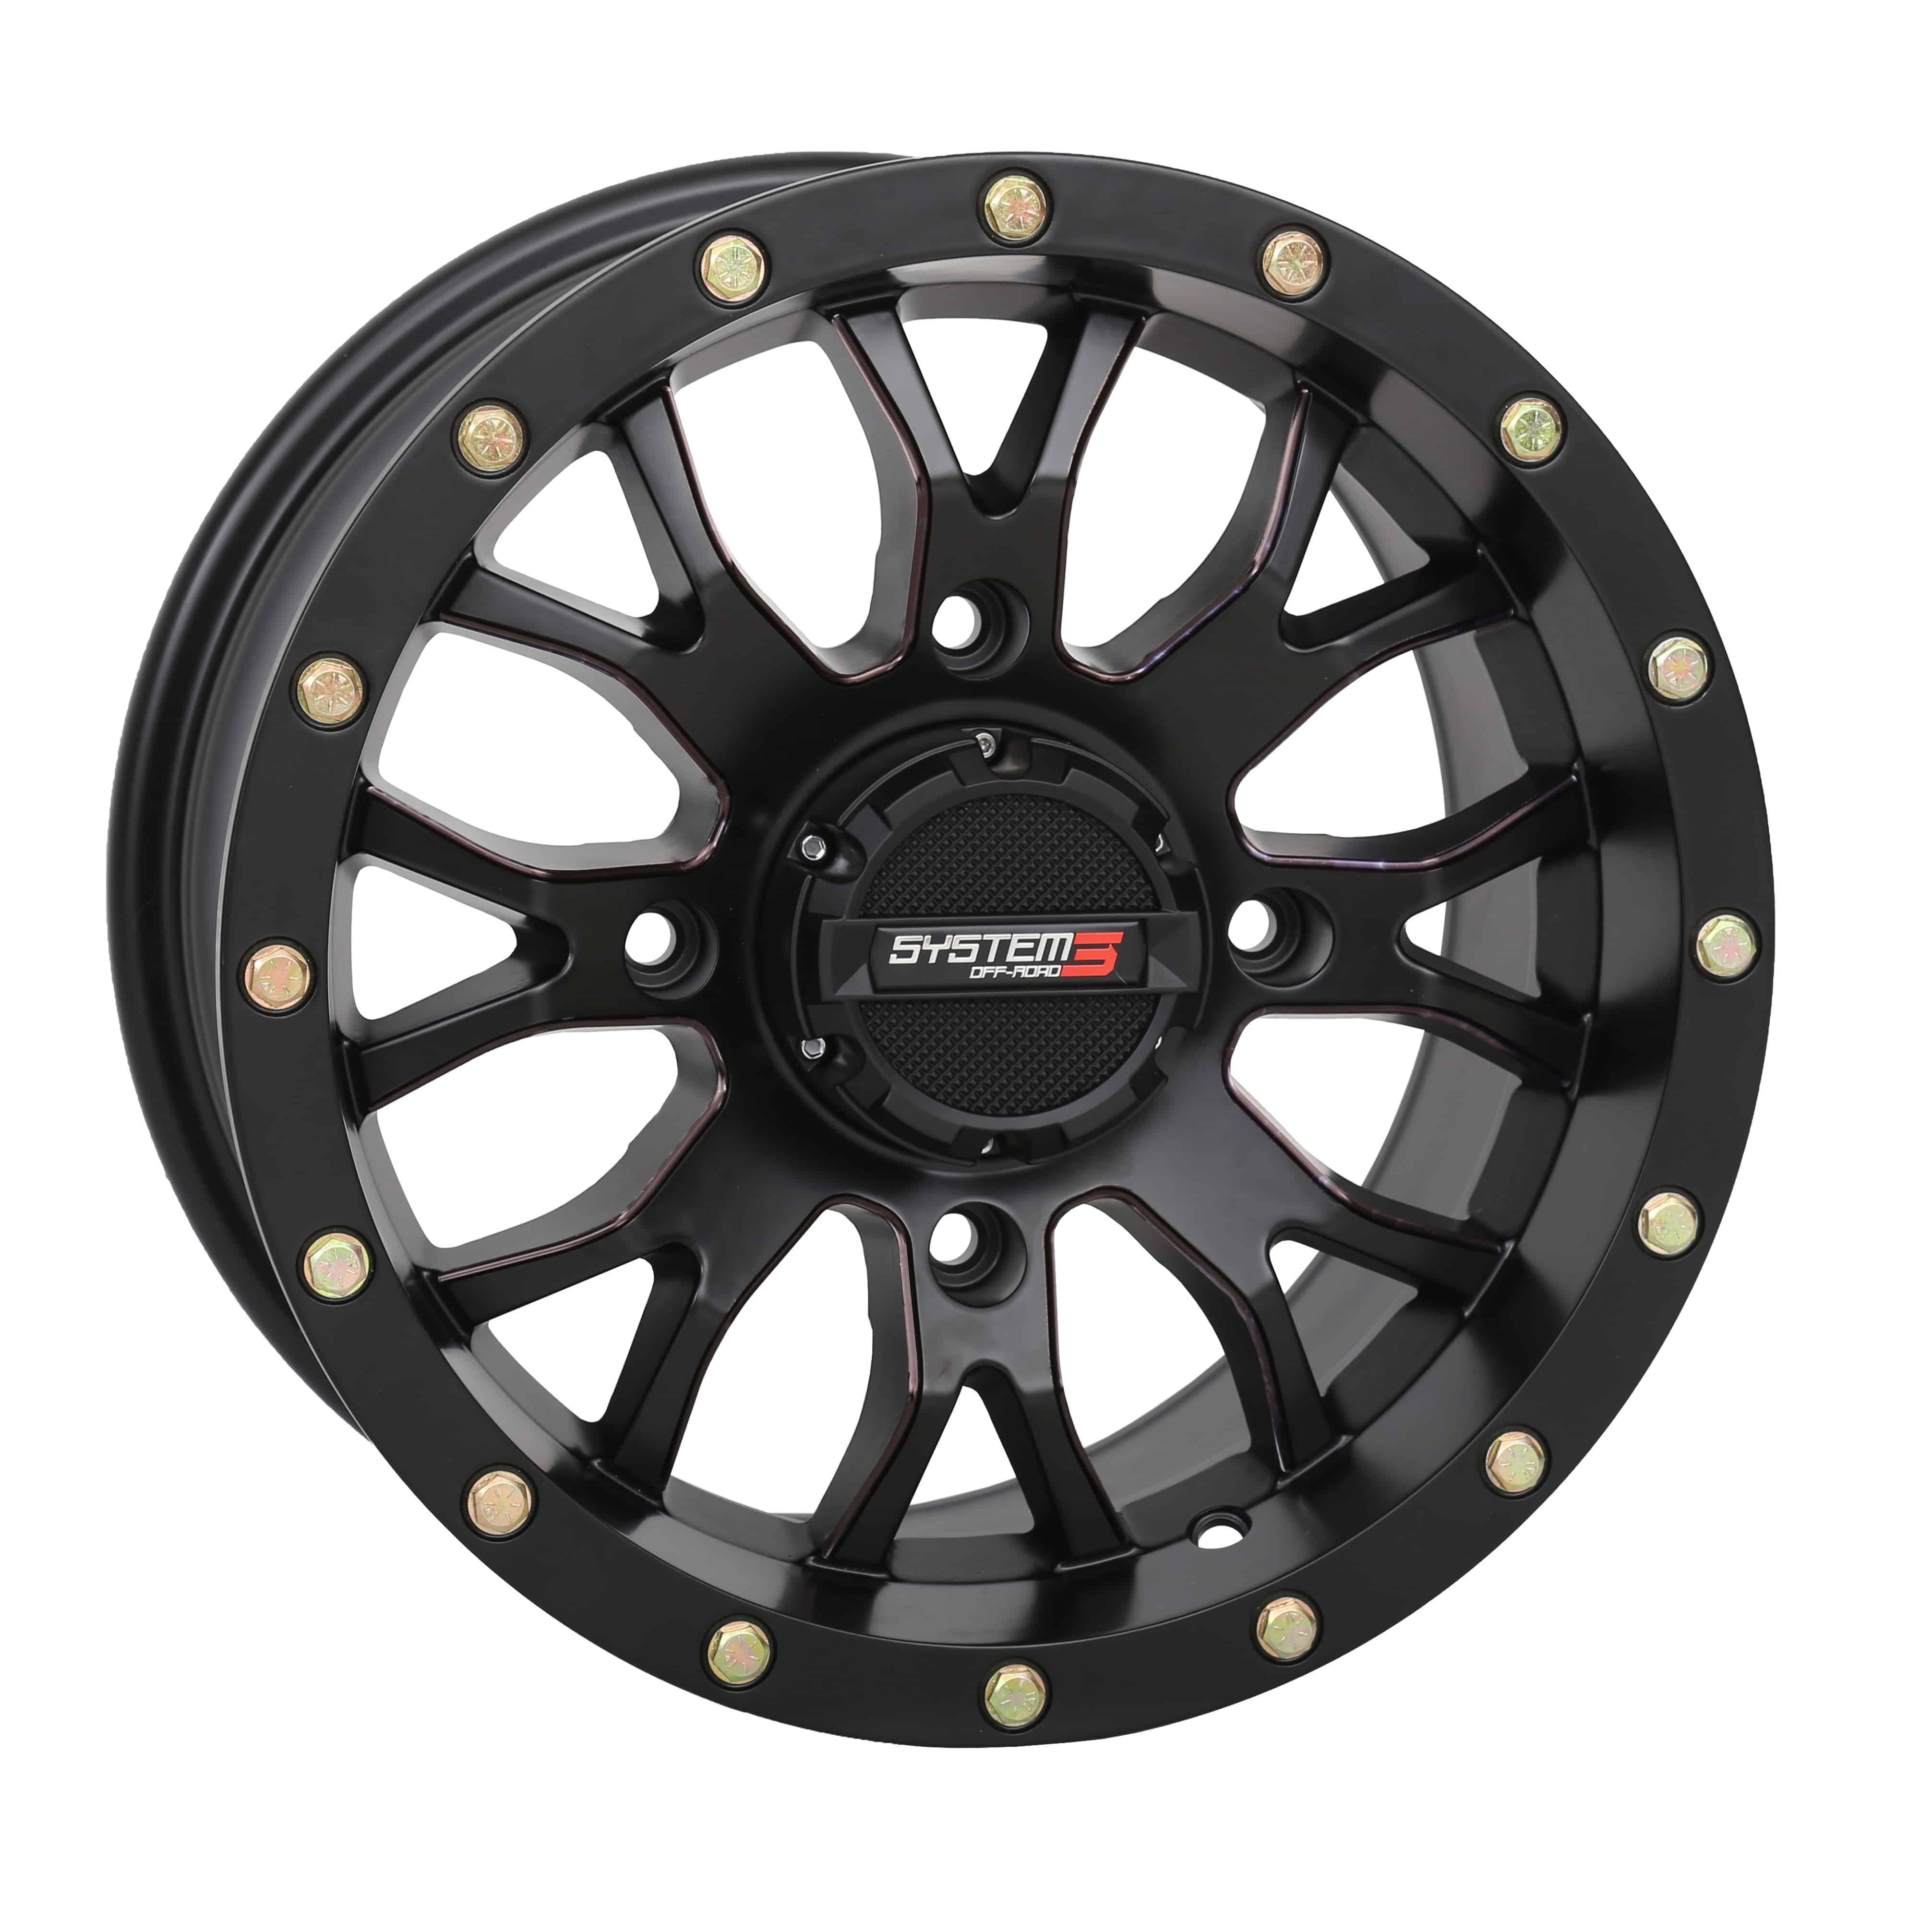 System 3 All New Tire And Wheel Brand Utv Sports Magazine